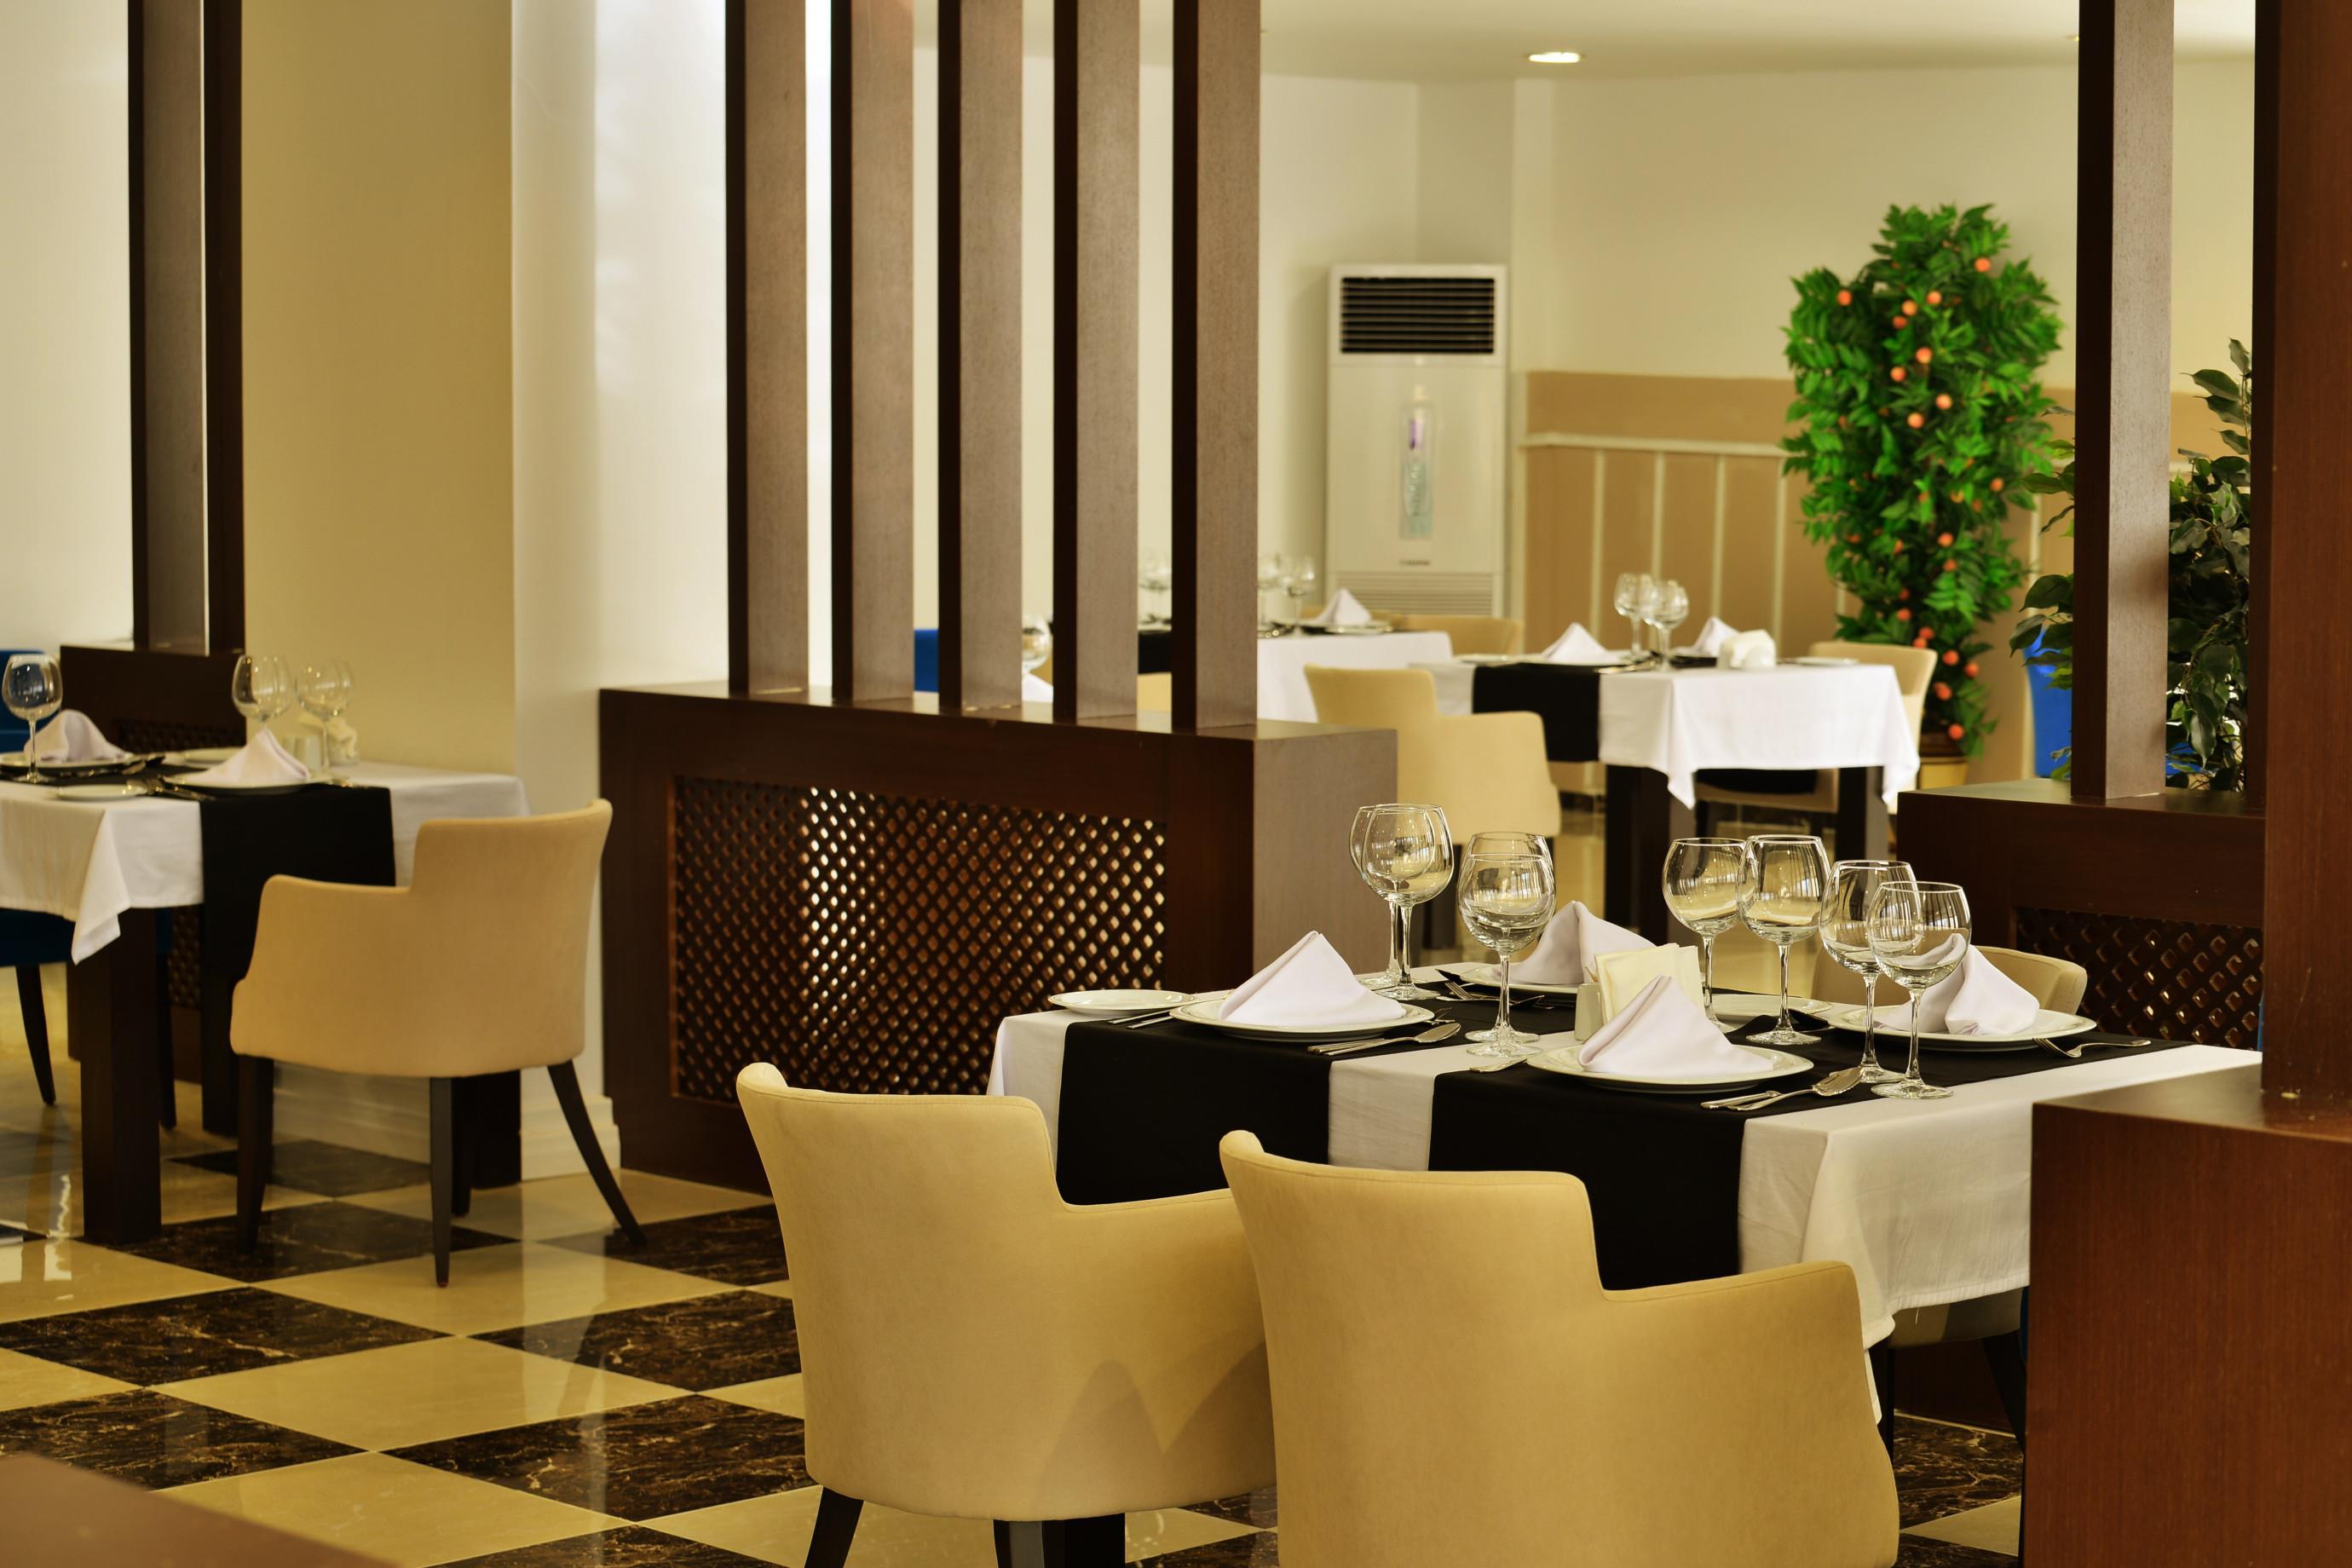 http://www.orextravel.sk/OREX/hotelphotos/side-royal-paradise-general-0031.jpg